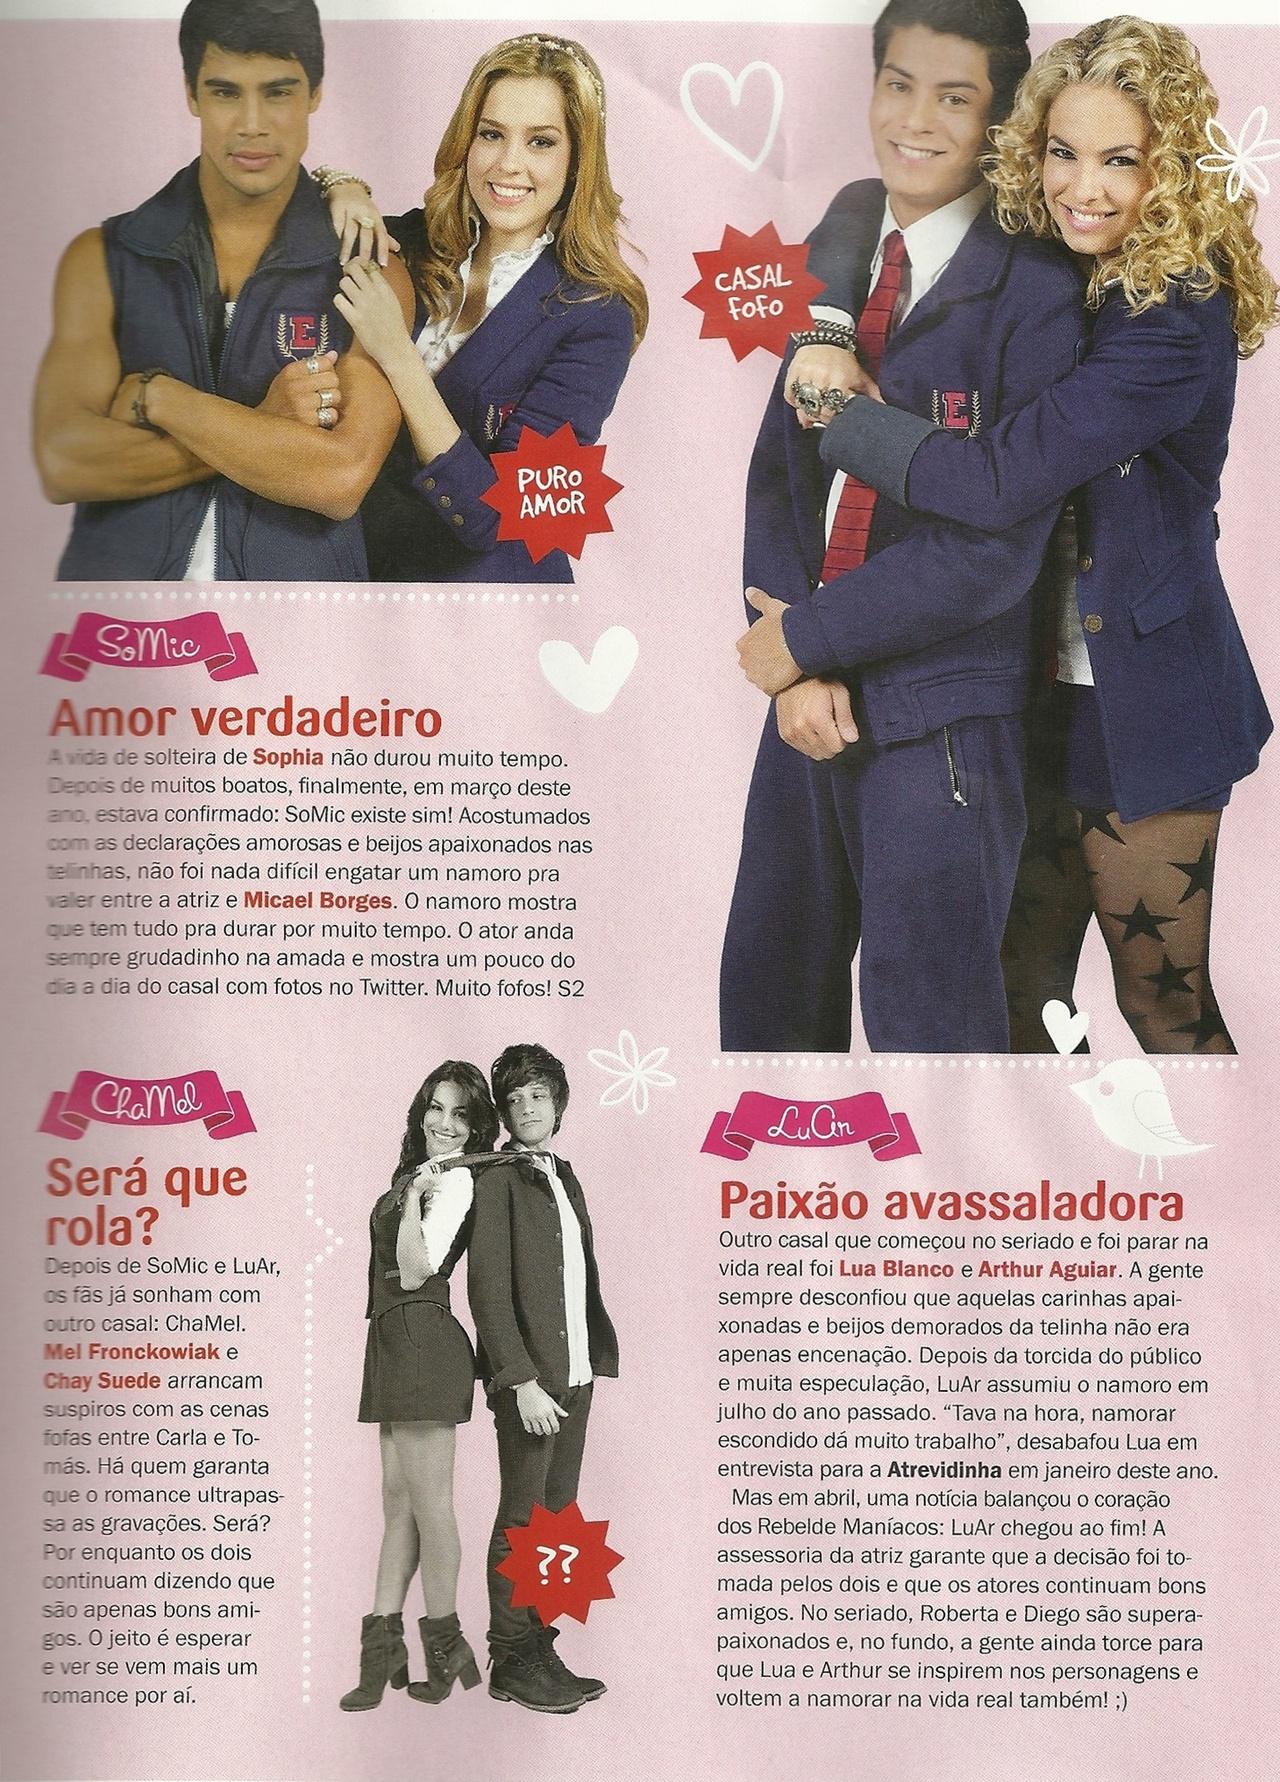 mel fronckowiak, miss bottom 2008, top 2 de miss mundo brasil 2007. - Página 6 3d7hfaxk